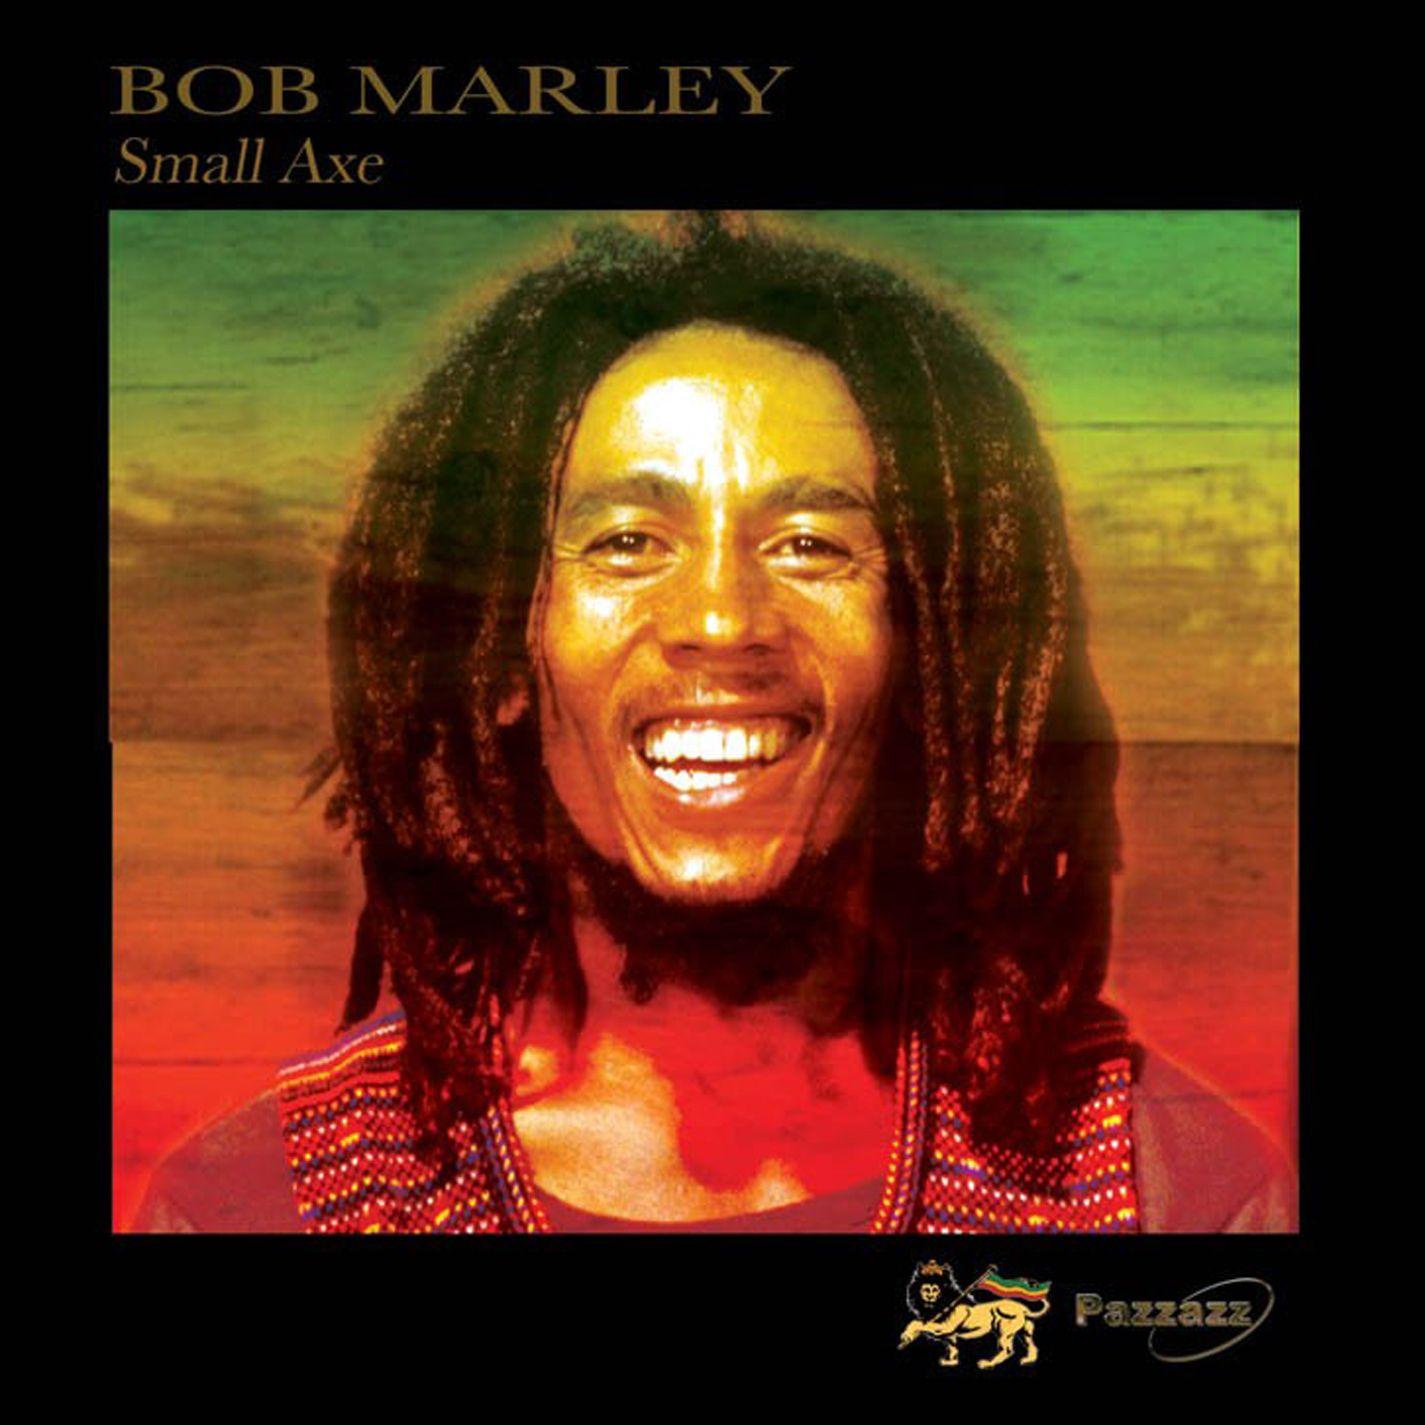 Bob Marley – Small Axe (single cover art)